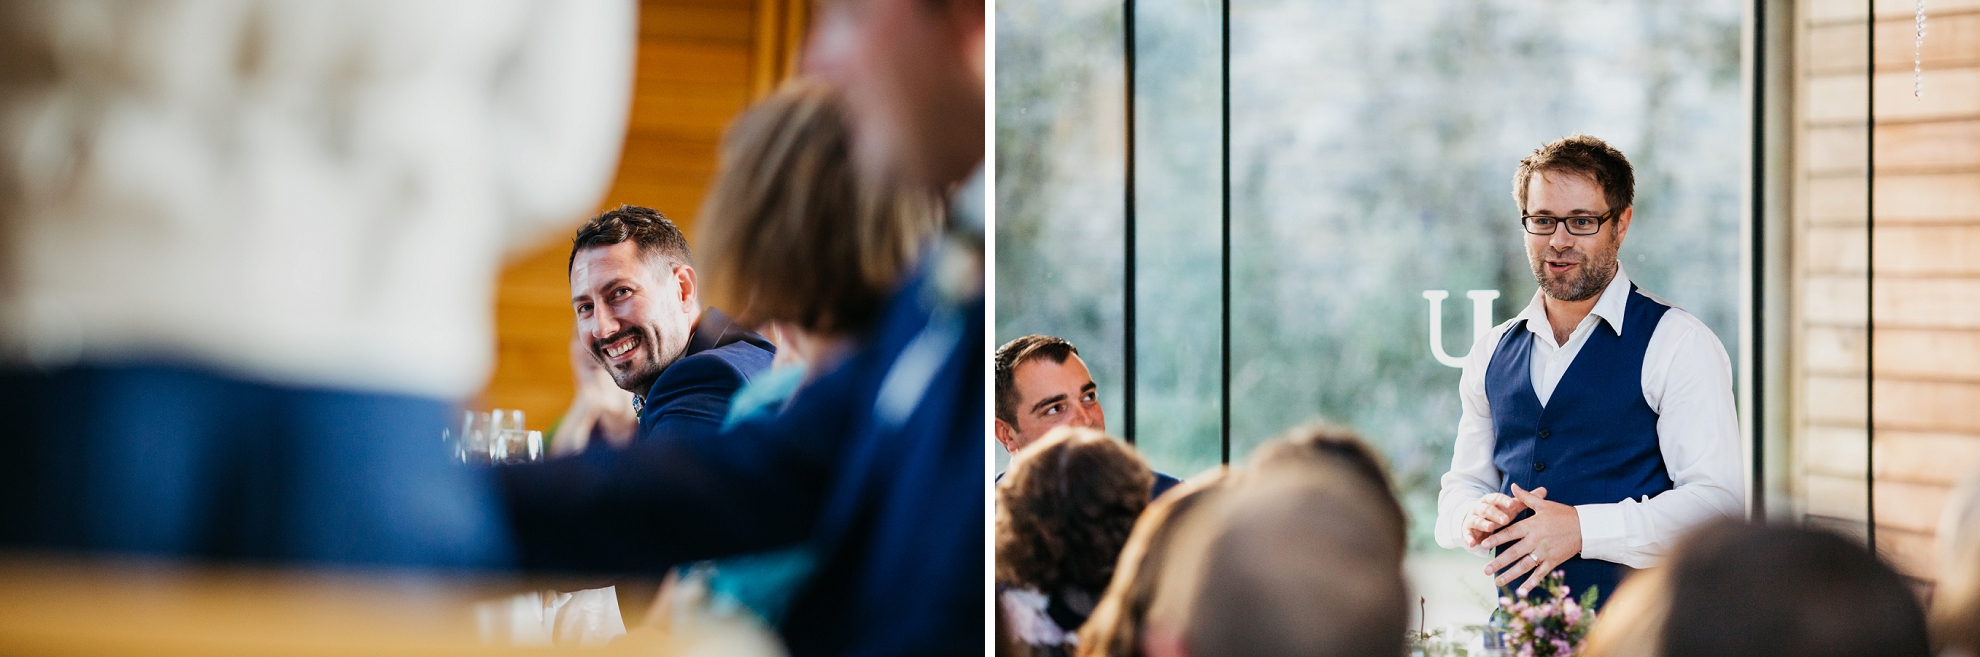 broughton-hall-wedding-photographer_067